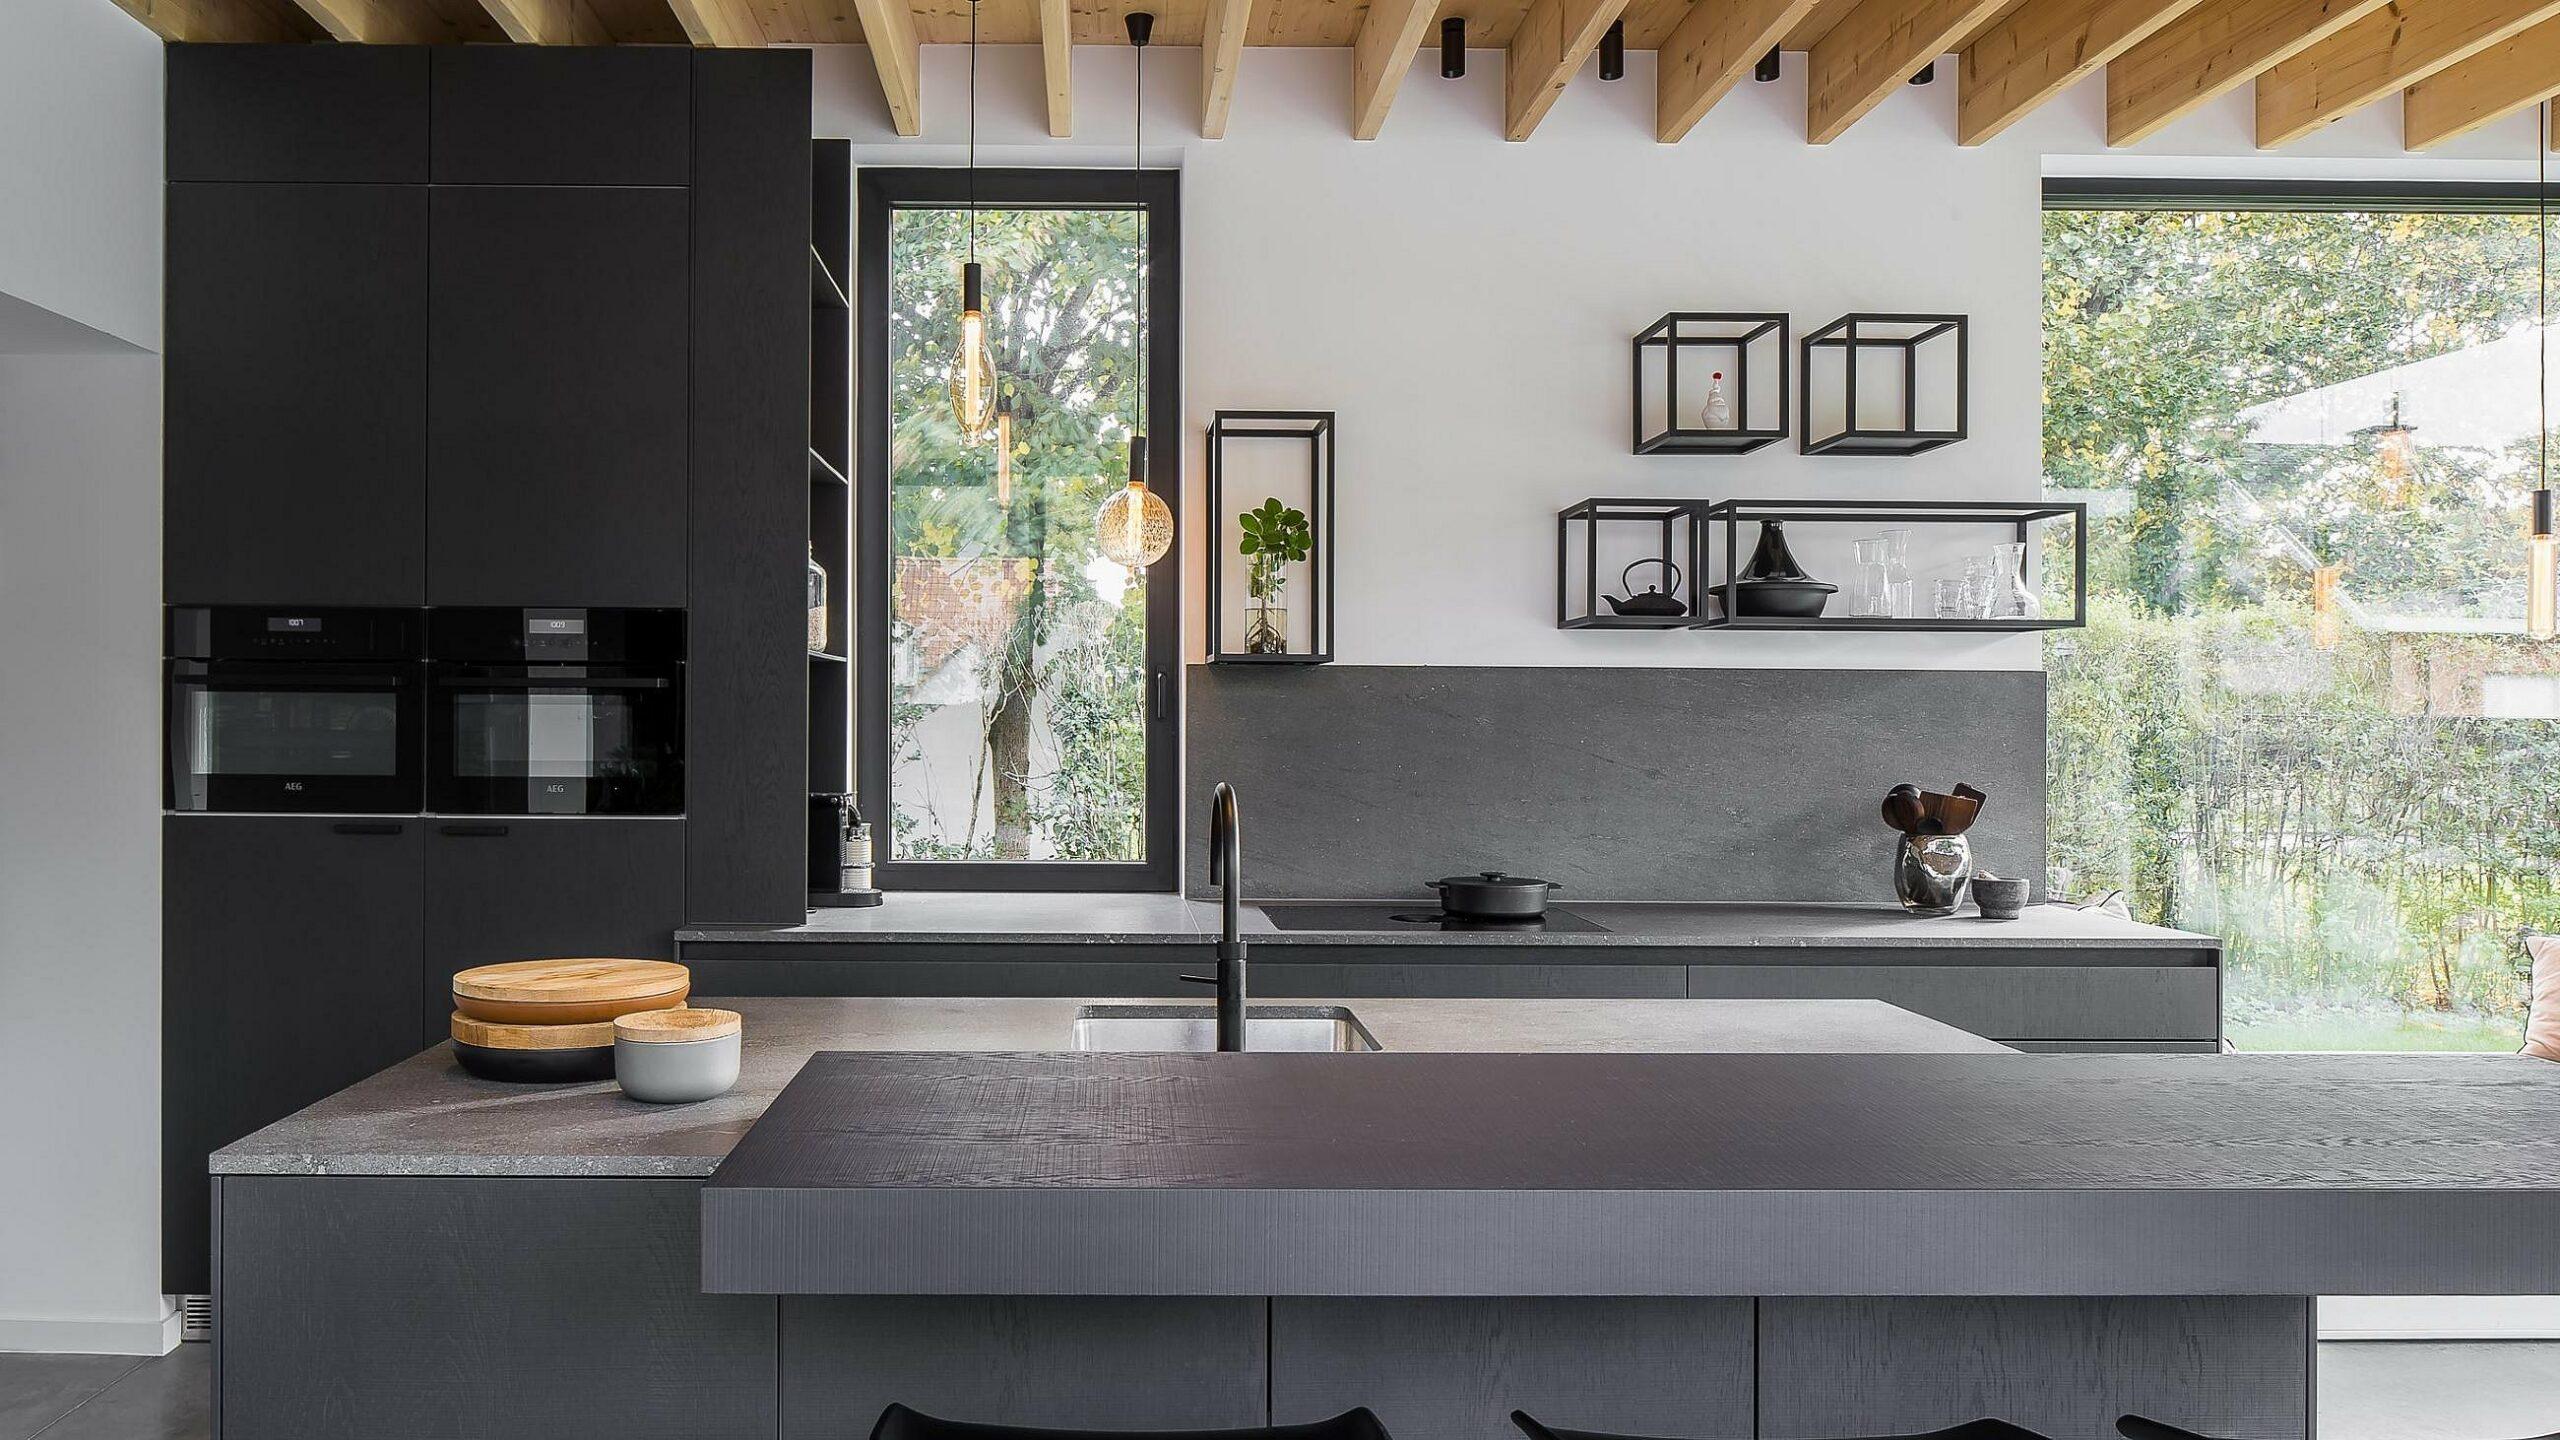 csm bulthaup ligna recta cafeine black oak 13 c59a6377fe scaled | Baeyens & Beck architecten Gent | architect nieuwbouw renovatie interieur | high end | architectenbureau